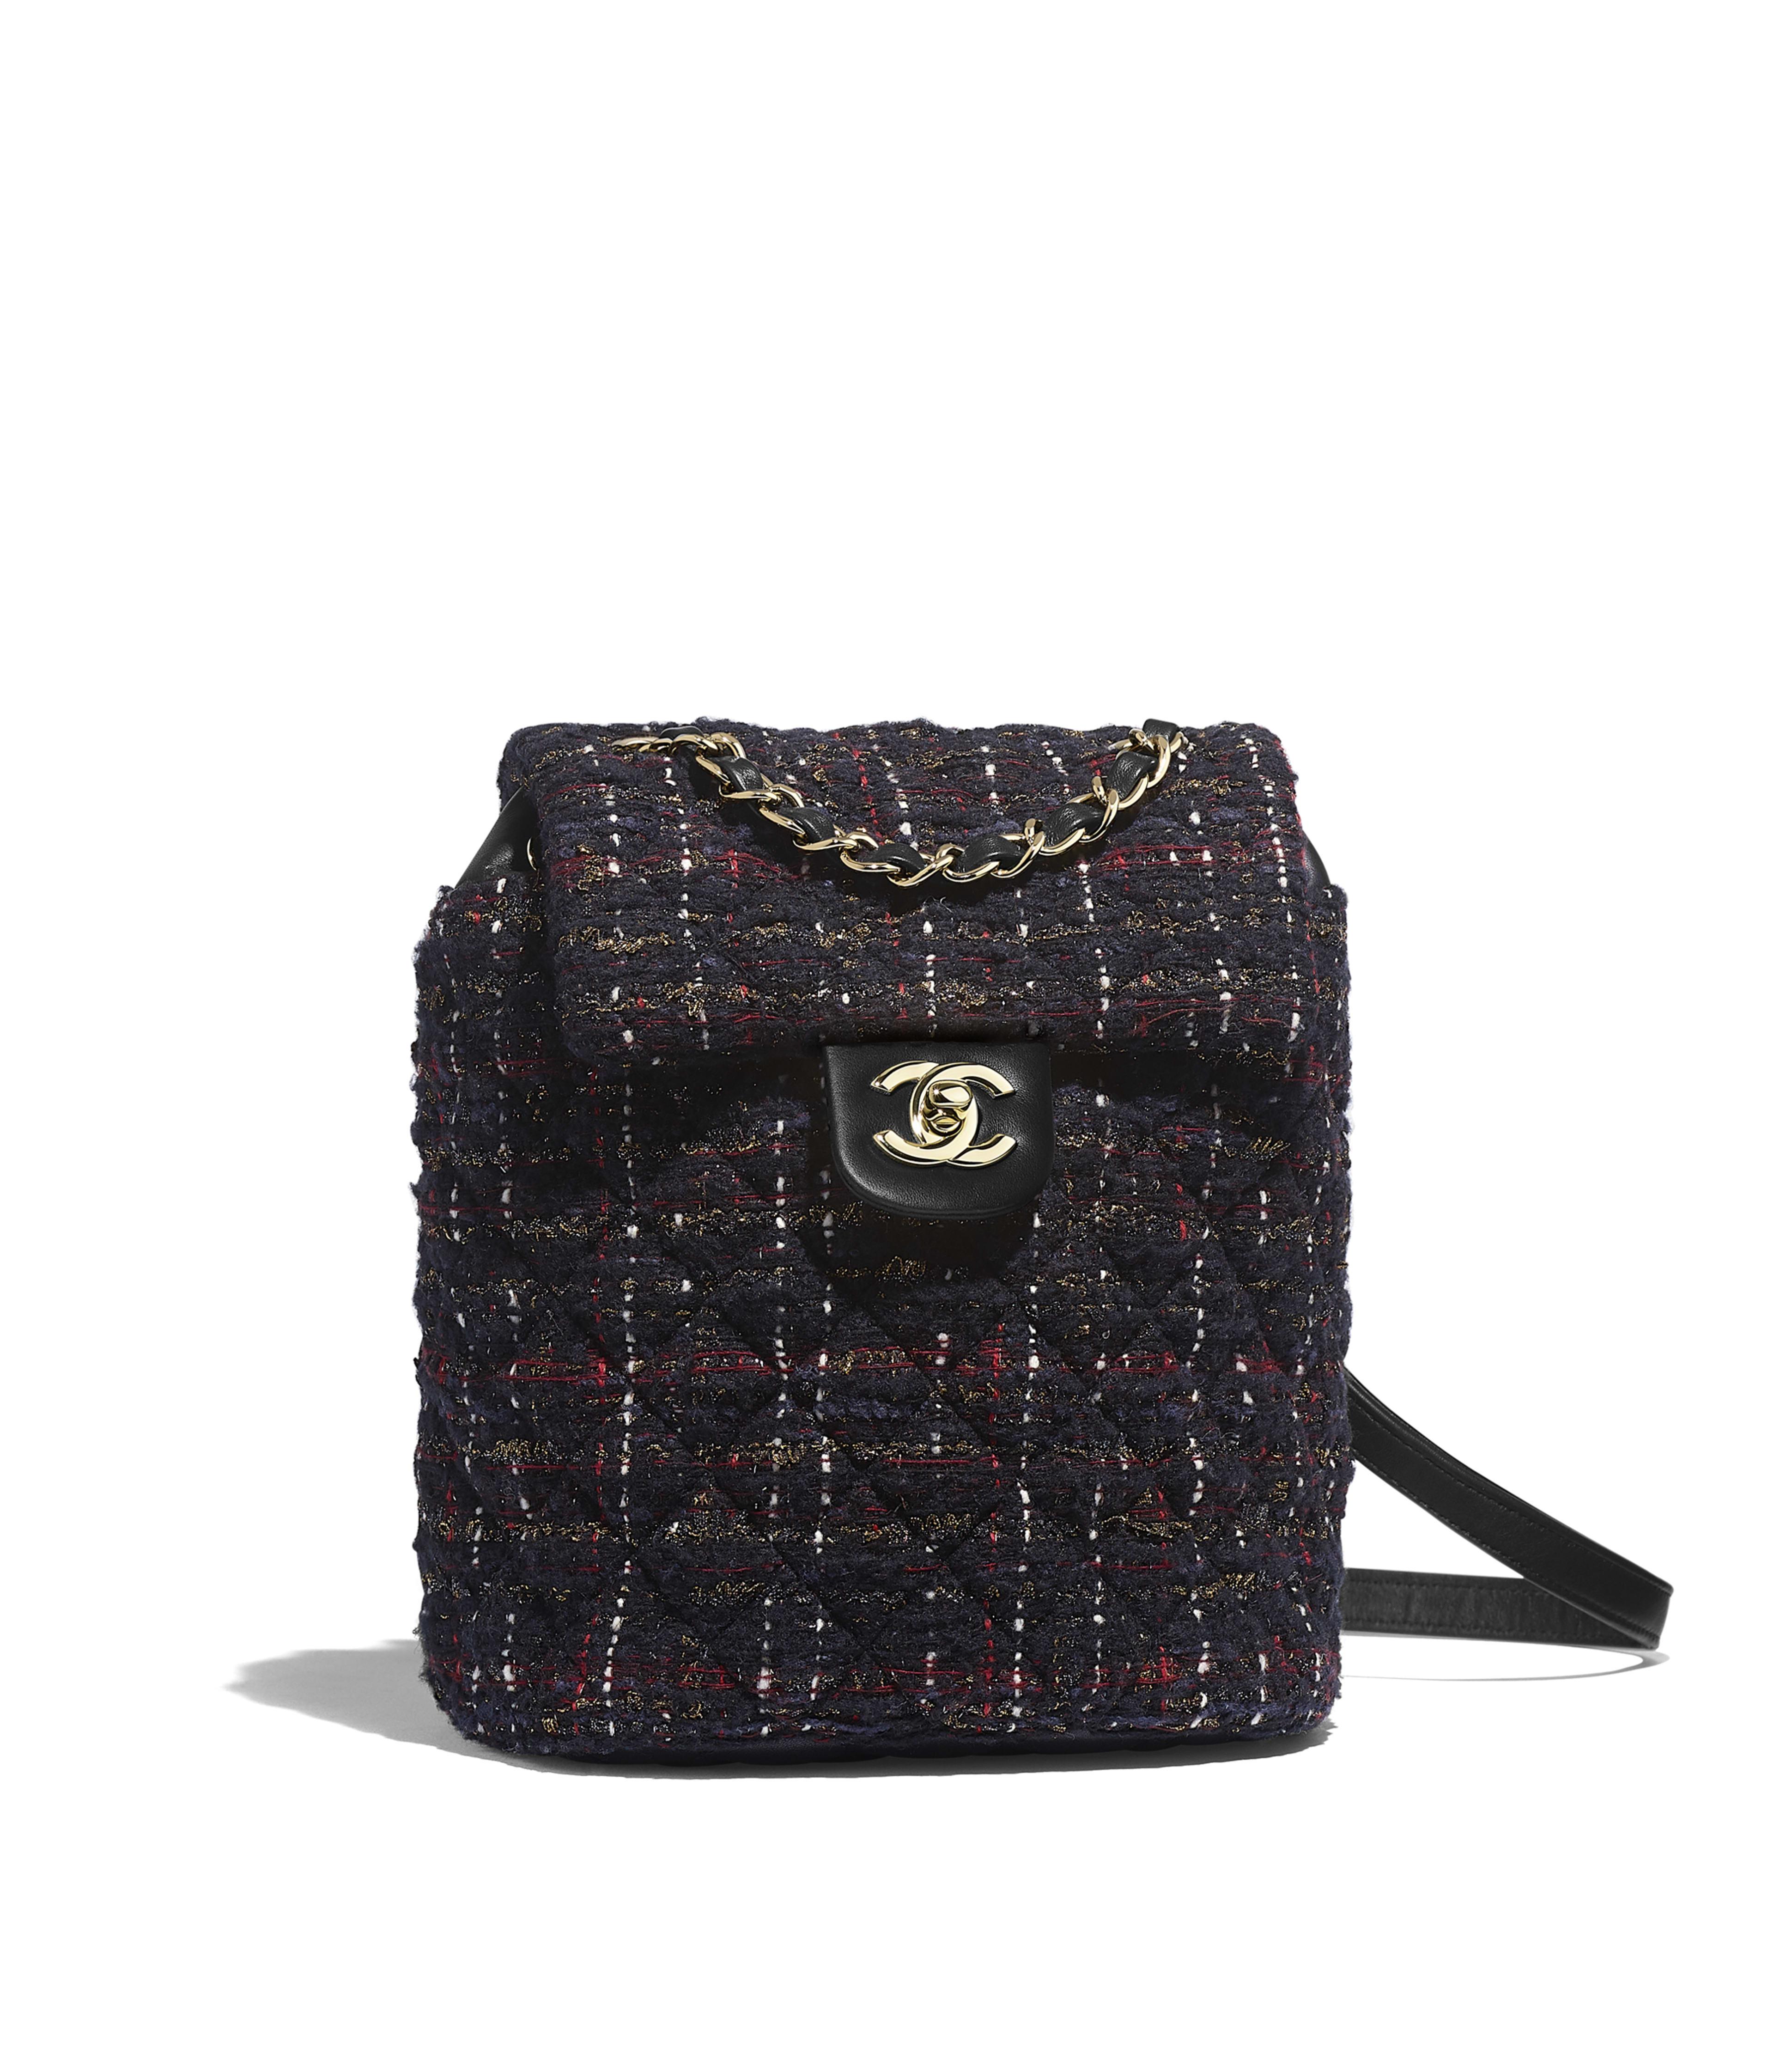 2d5f9f81f Backpack Tweed & Gold-Tone Metal, Black, Red, Gold & Ecru Ref.  A69964B01044MG507